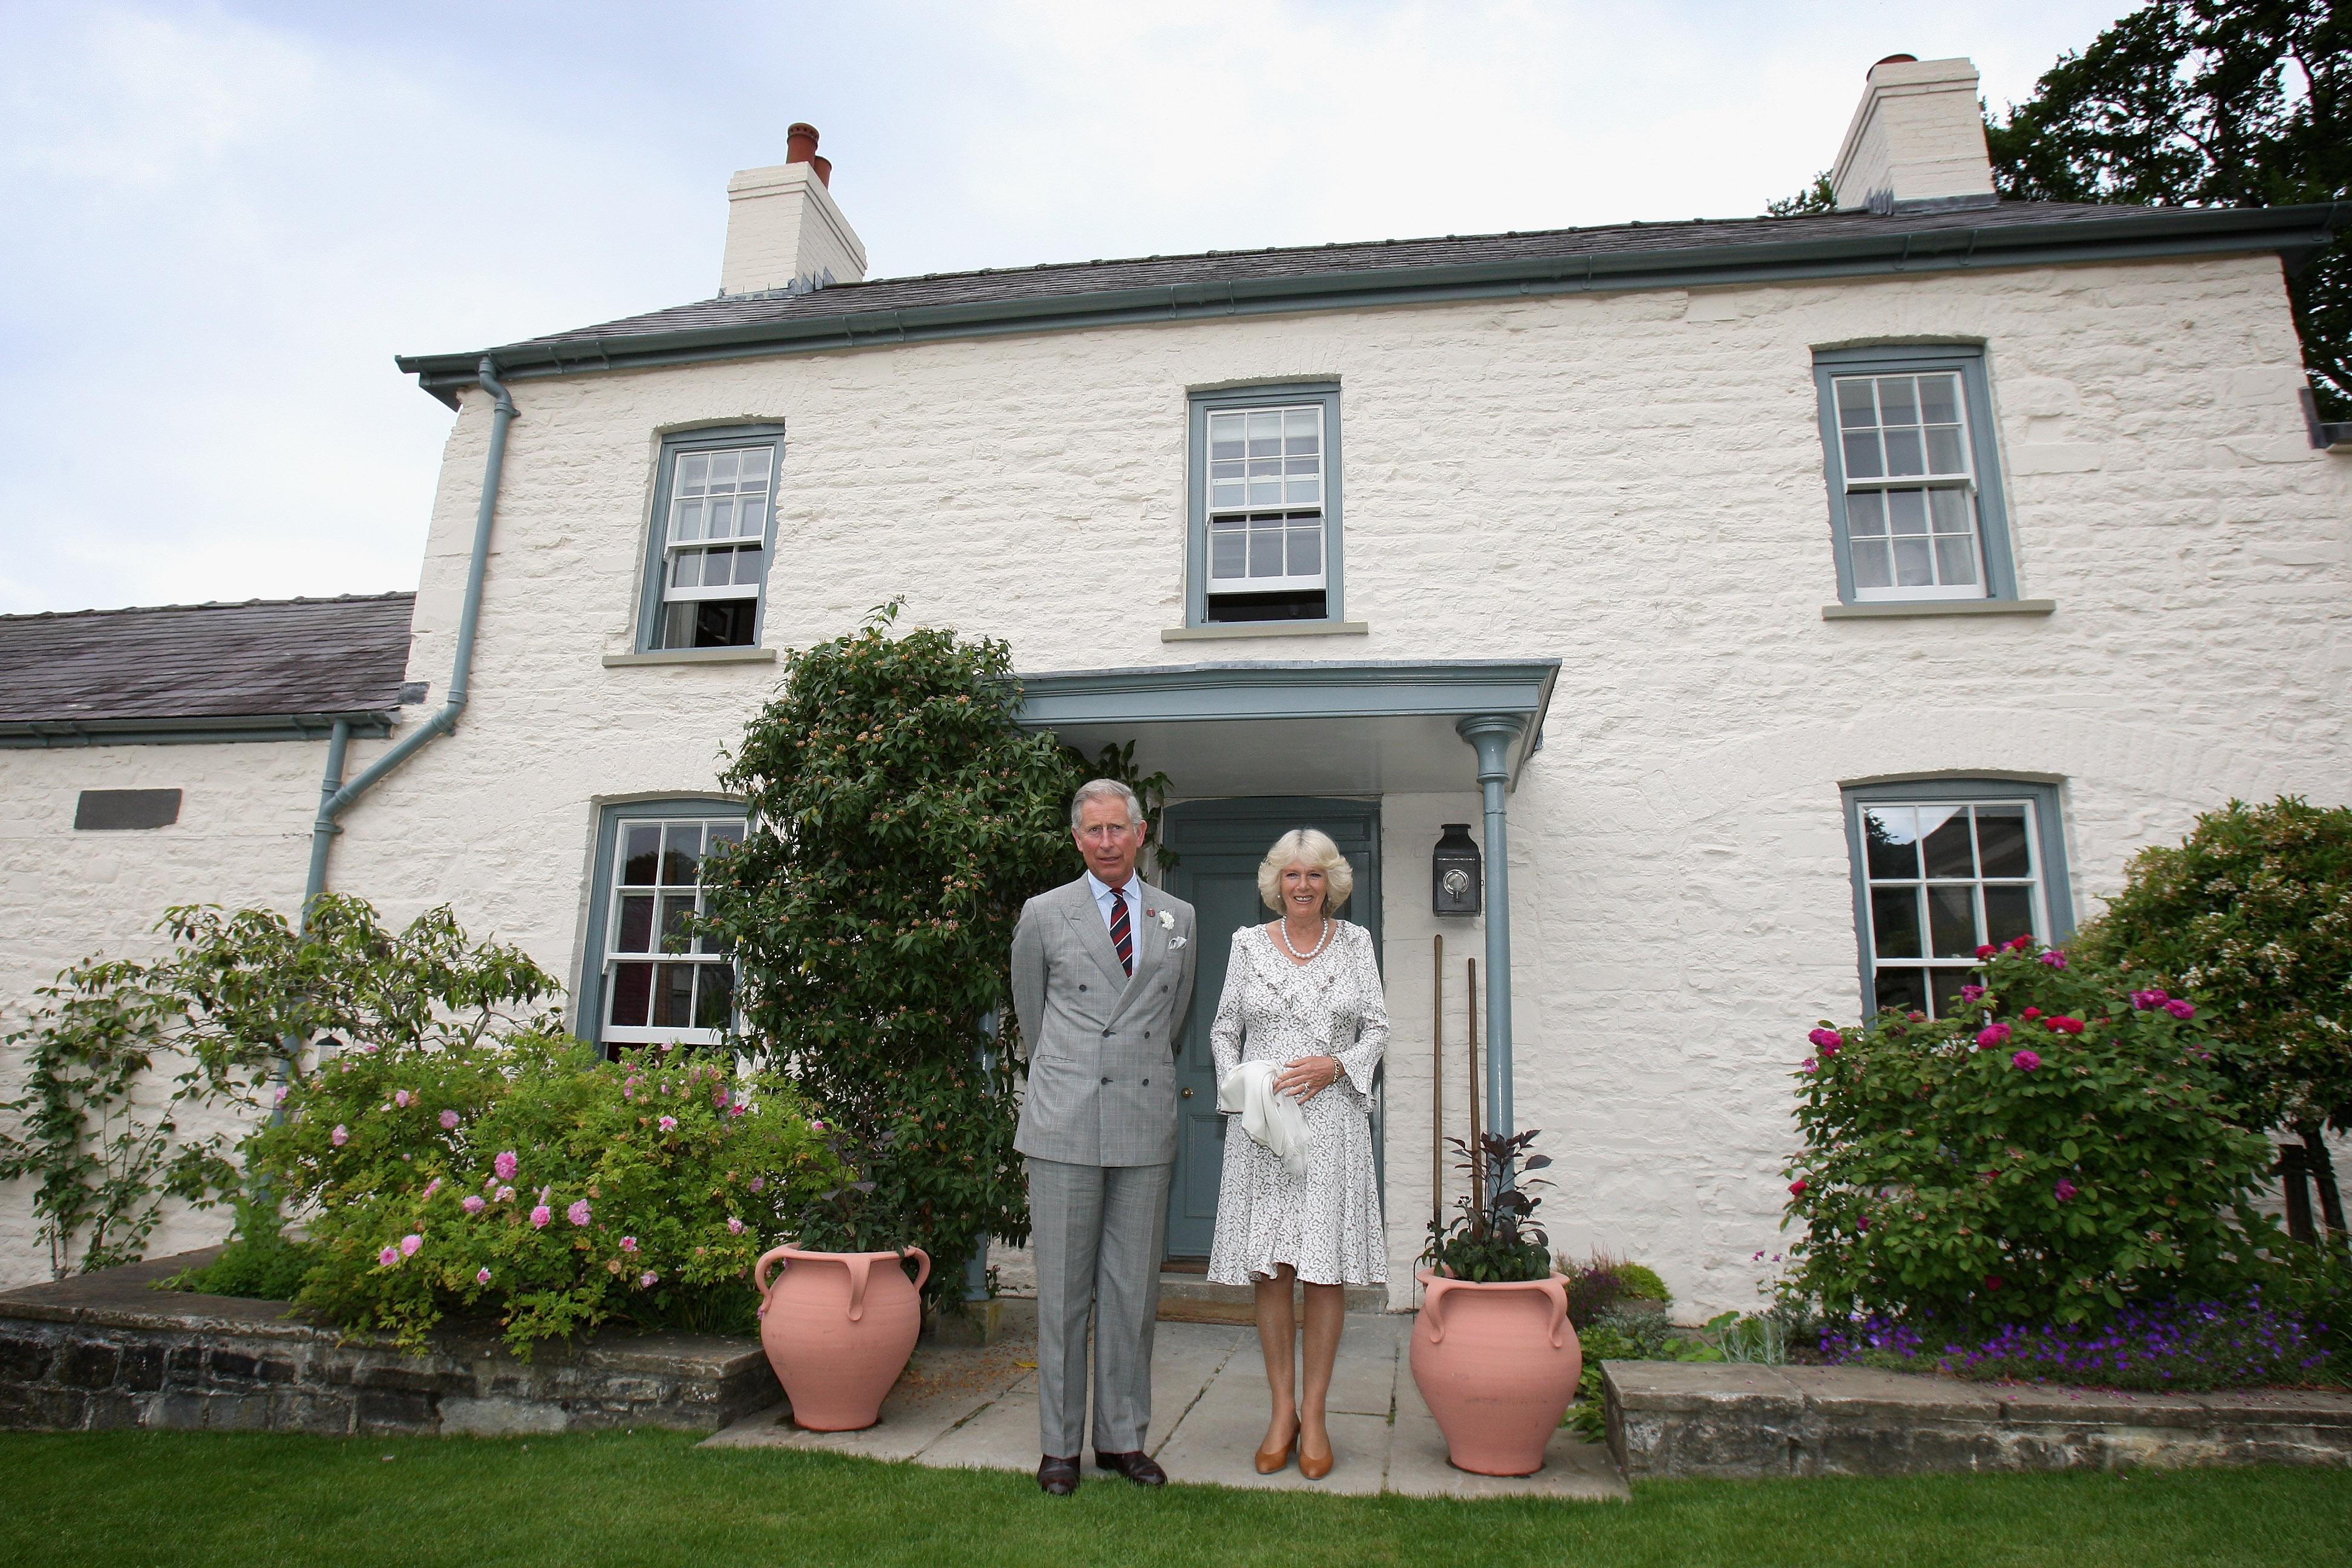 Károly herceg háza Llwynywermodban